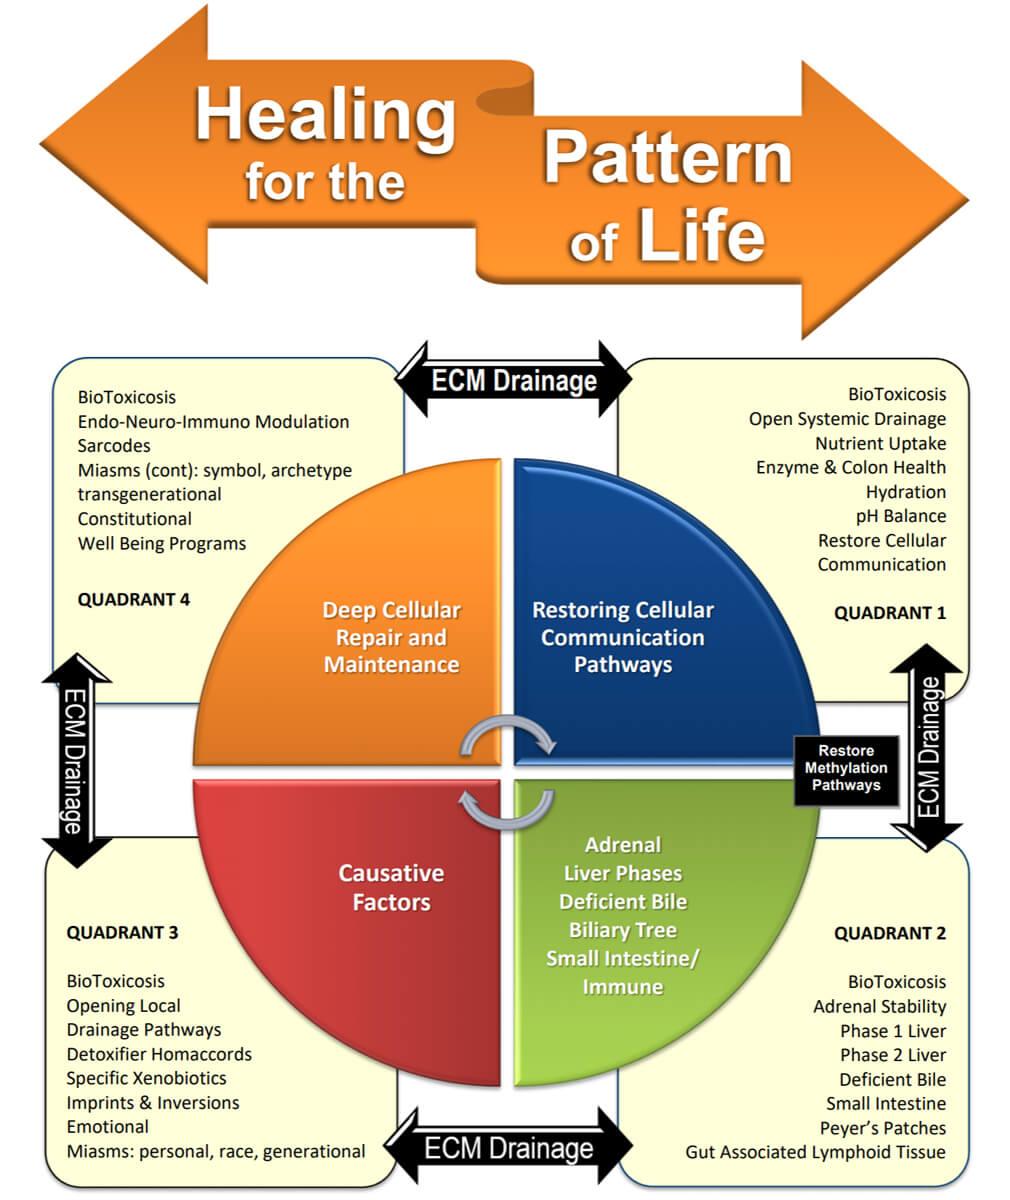 healing-pattern-new.jpg